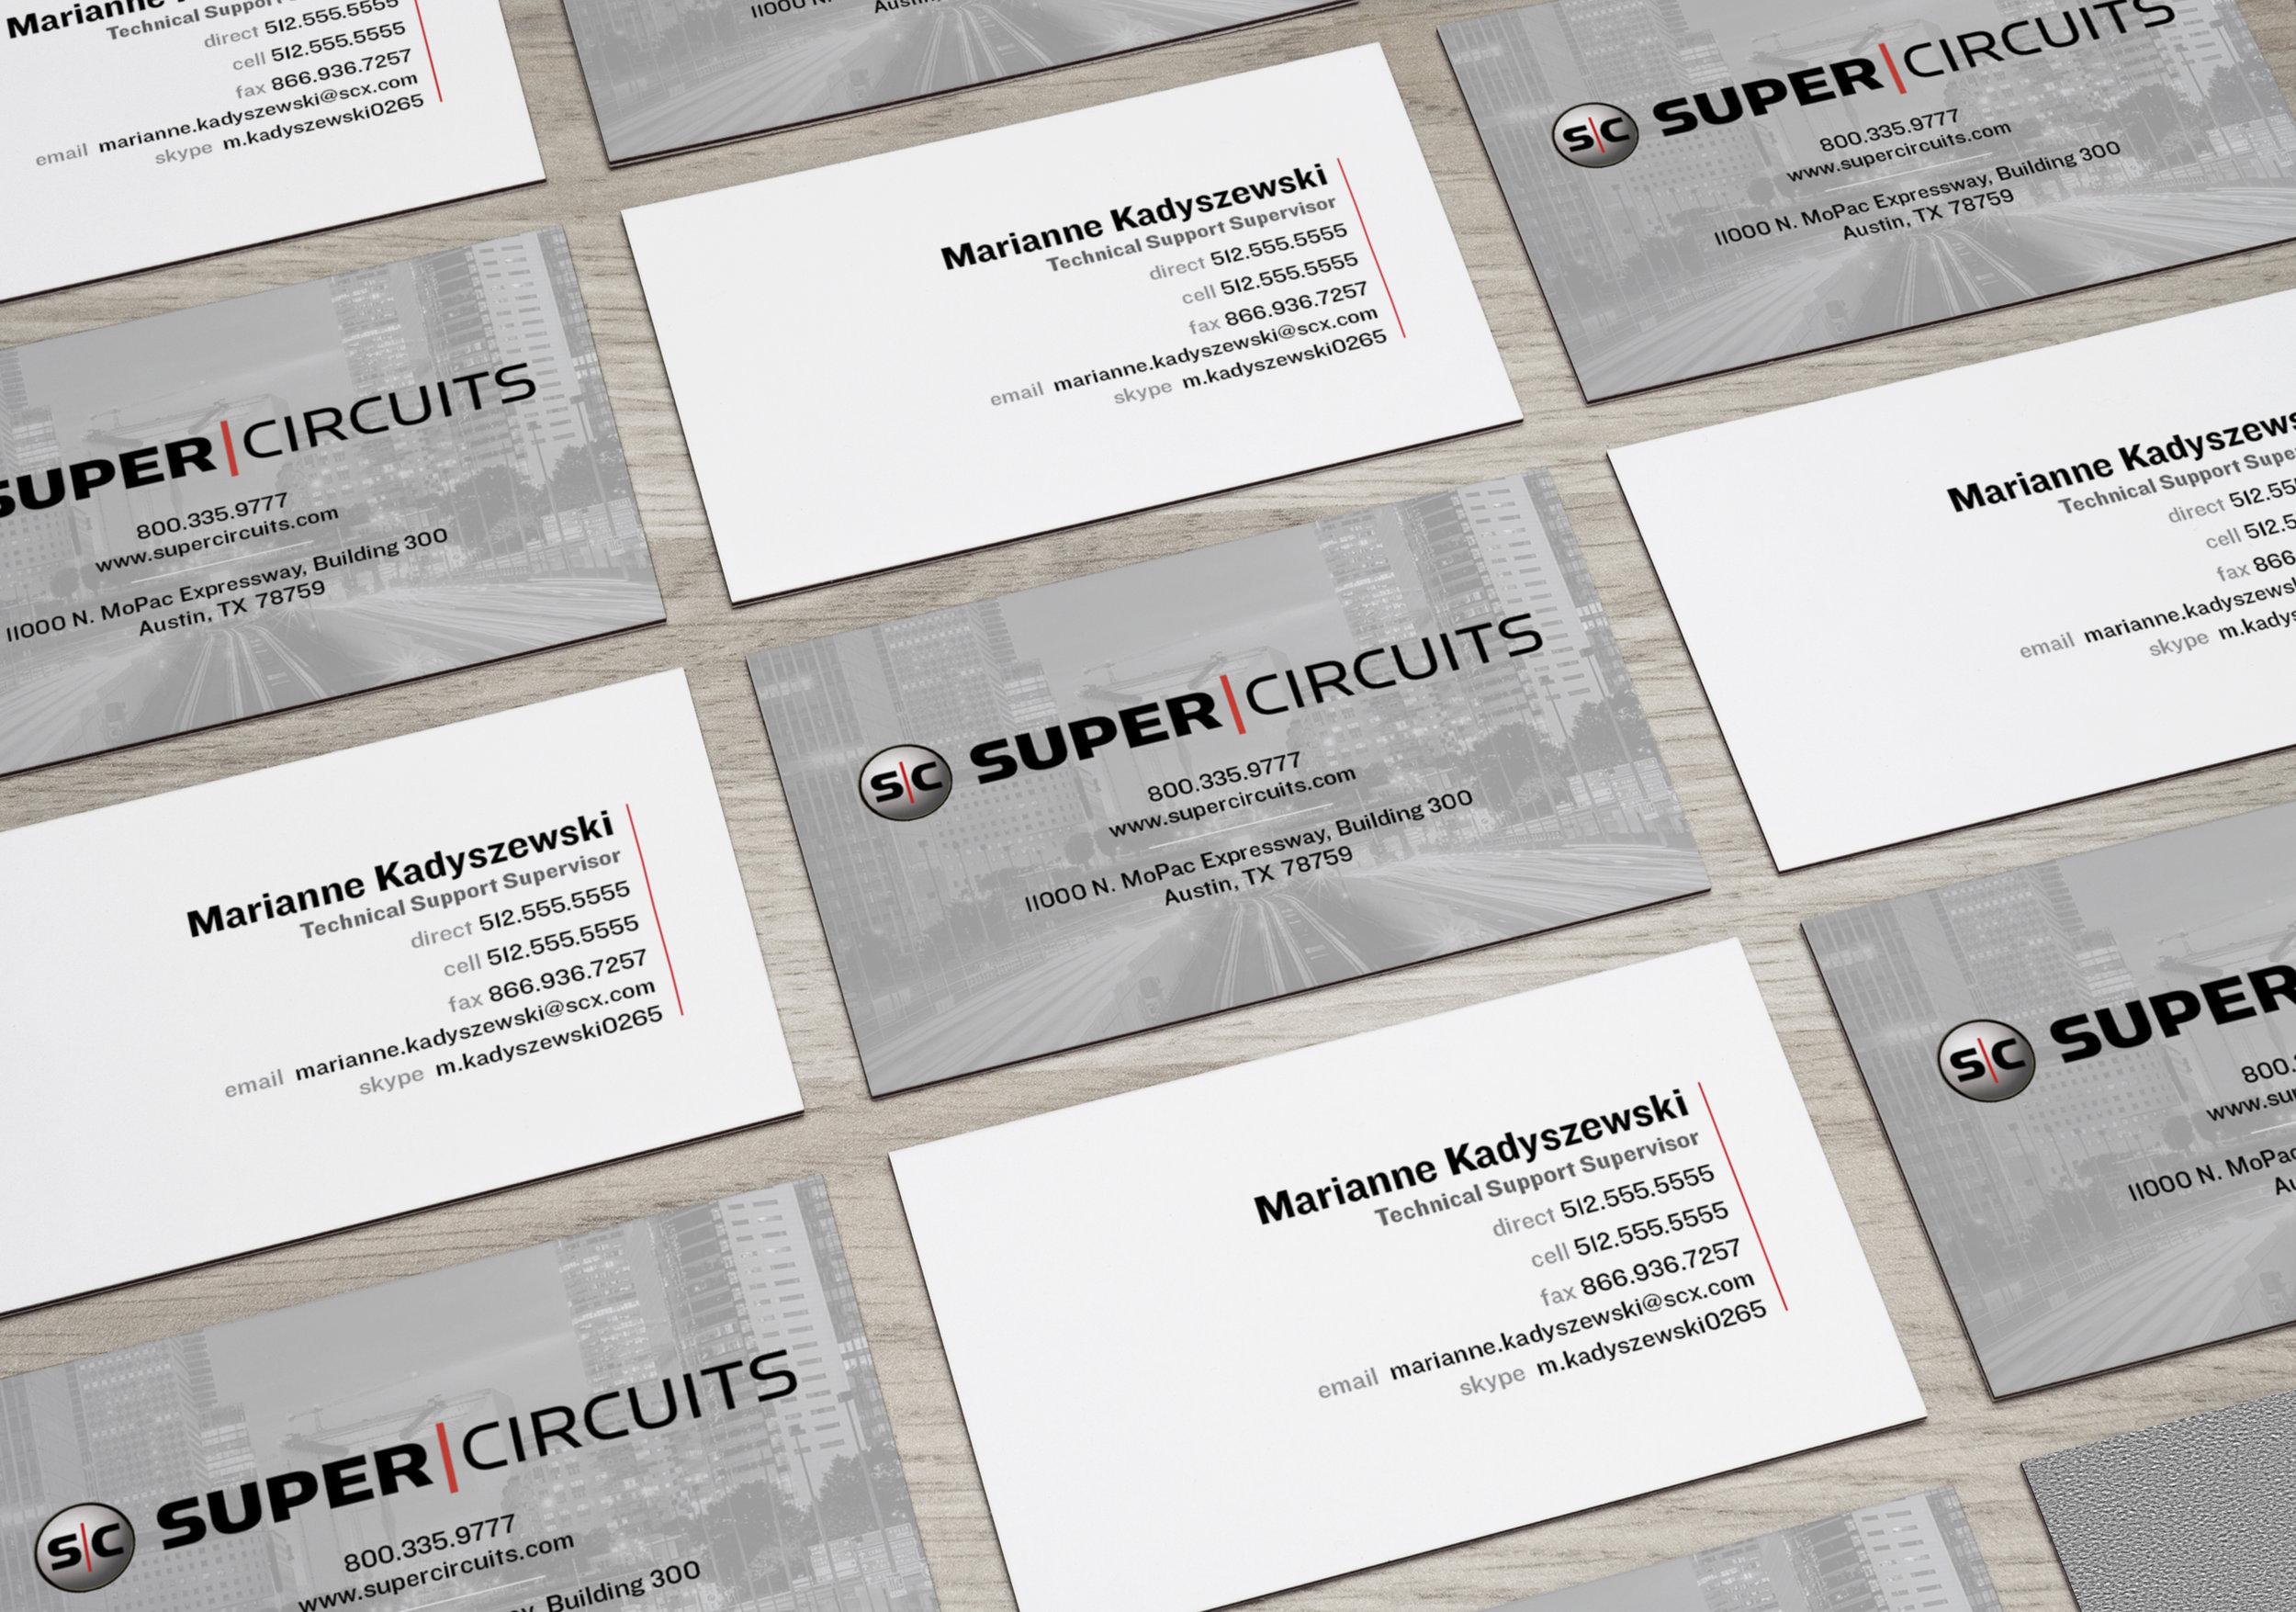 supercircuit-businesscards-mockup-1.jpg